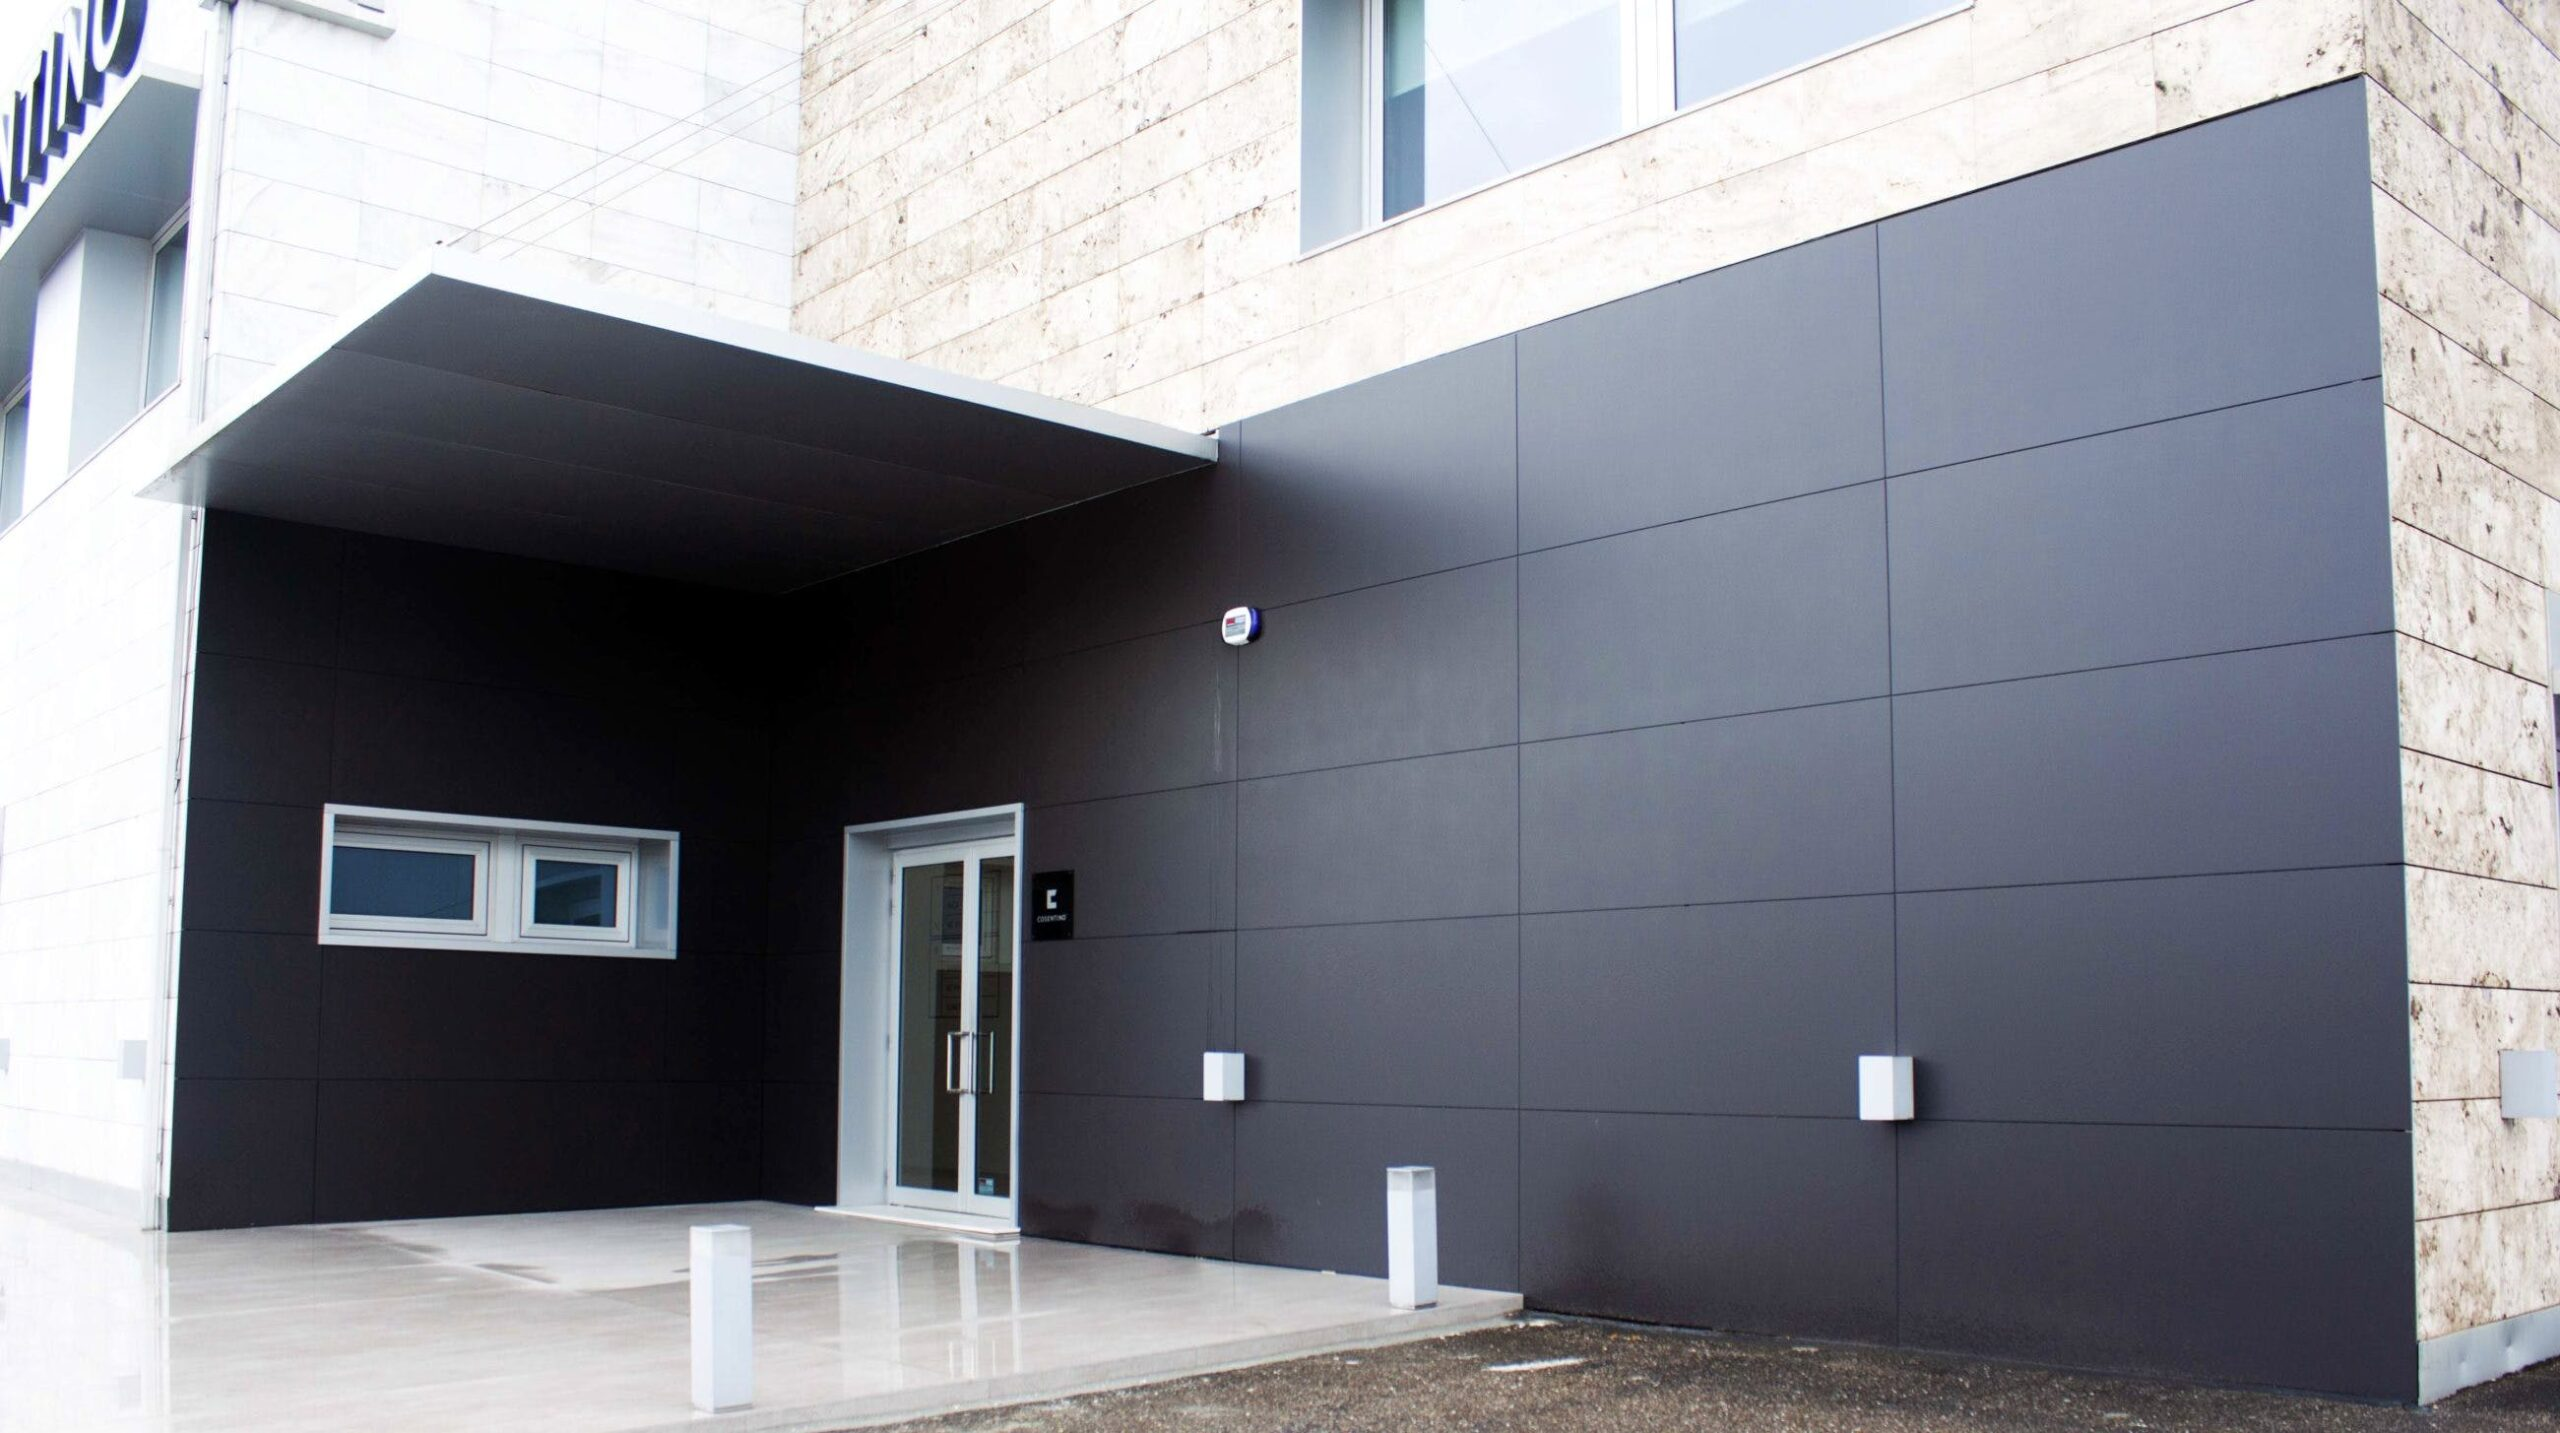 Image of Cosentino Vigo Center Fachada Dekton Domoos 2 scaled in Cosentino Center Vigo undertakes a beautiful renovation - Cosentino